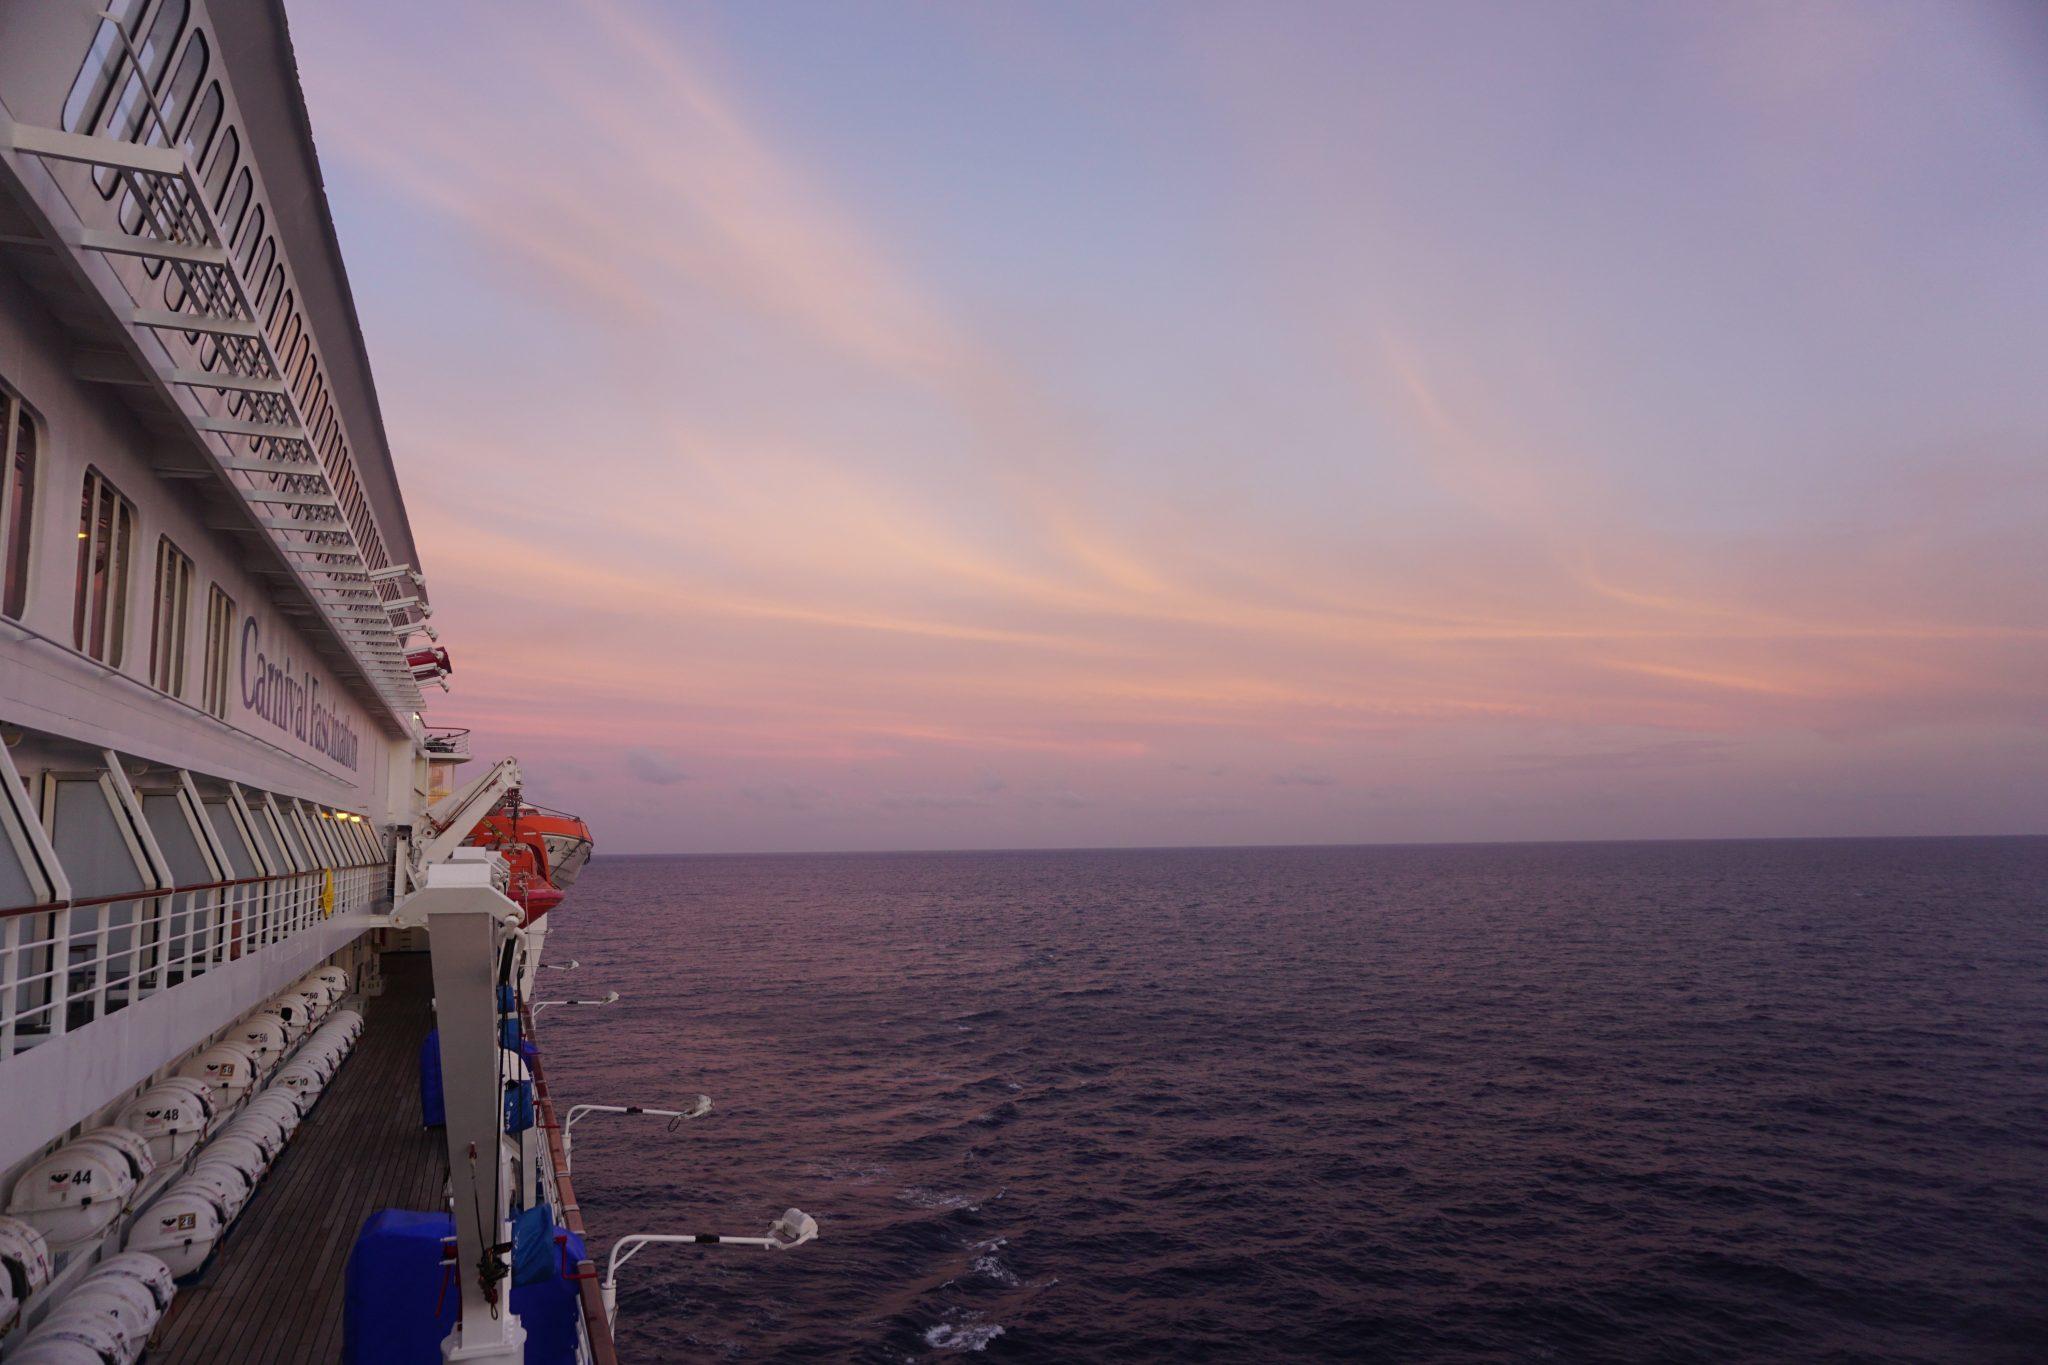 cruise sunset fittwotravel.com